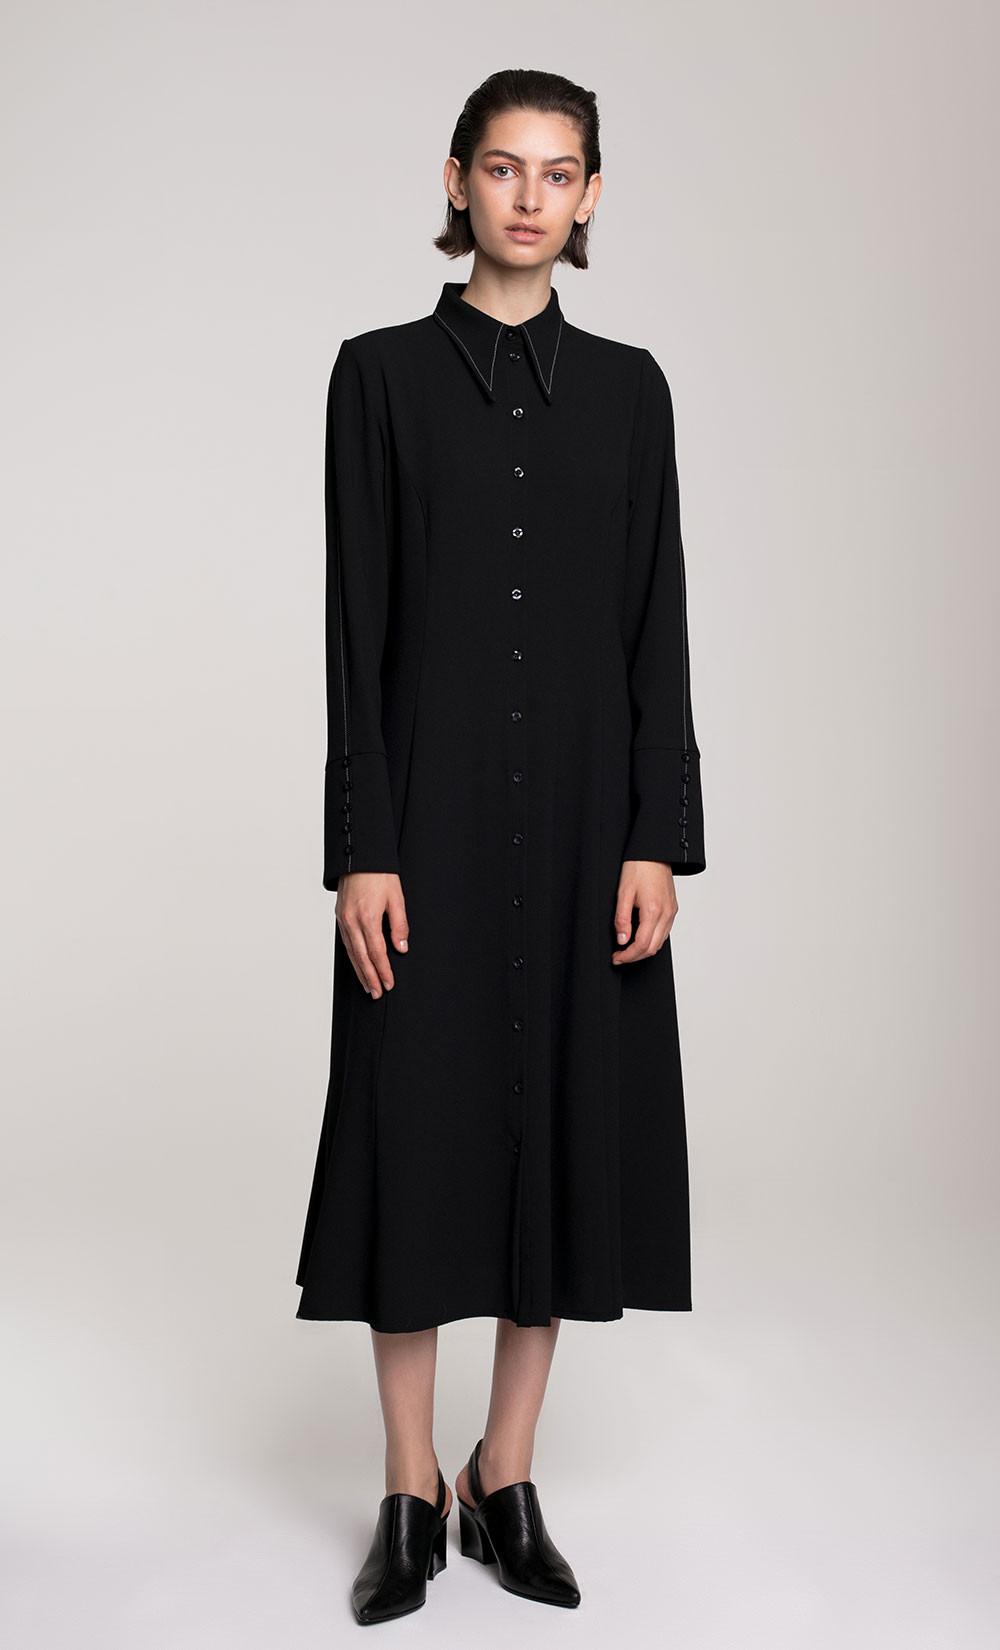 Calimera Dress